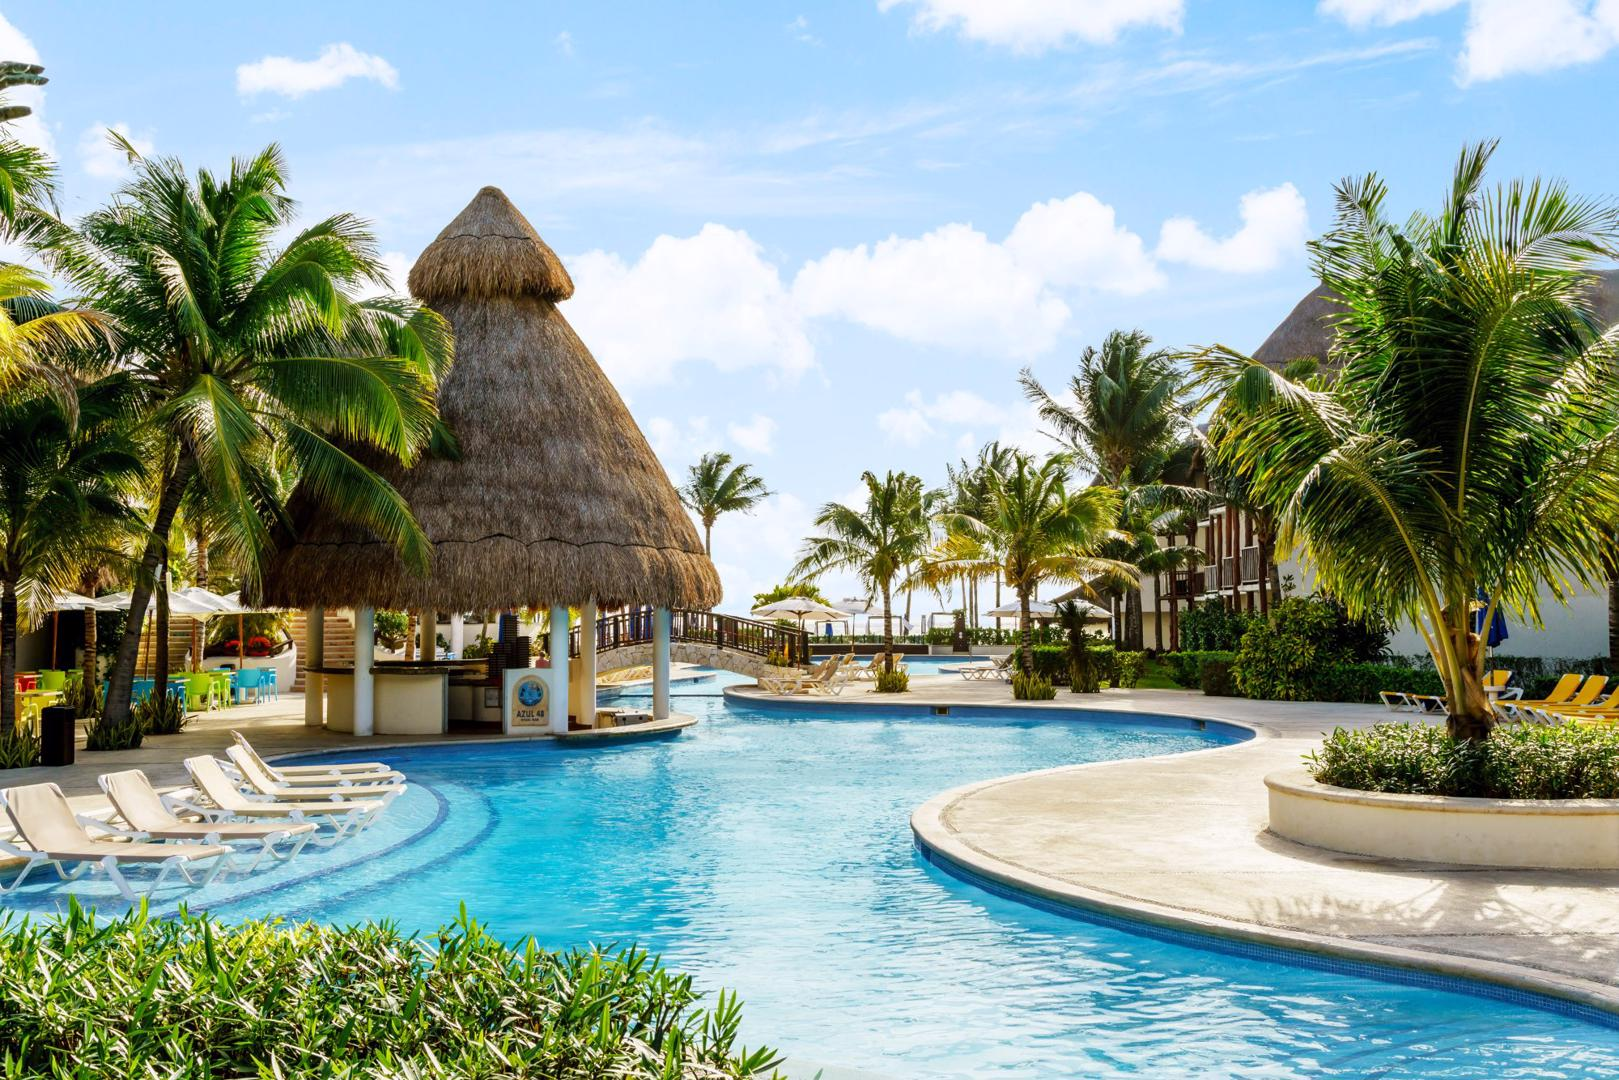 8 daagse vliegvakantie naar Reef Coco Beach in playa del carmen, mexico